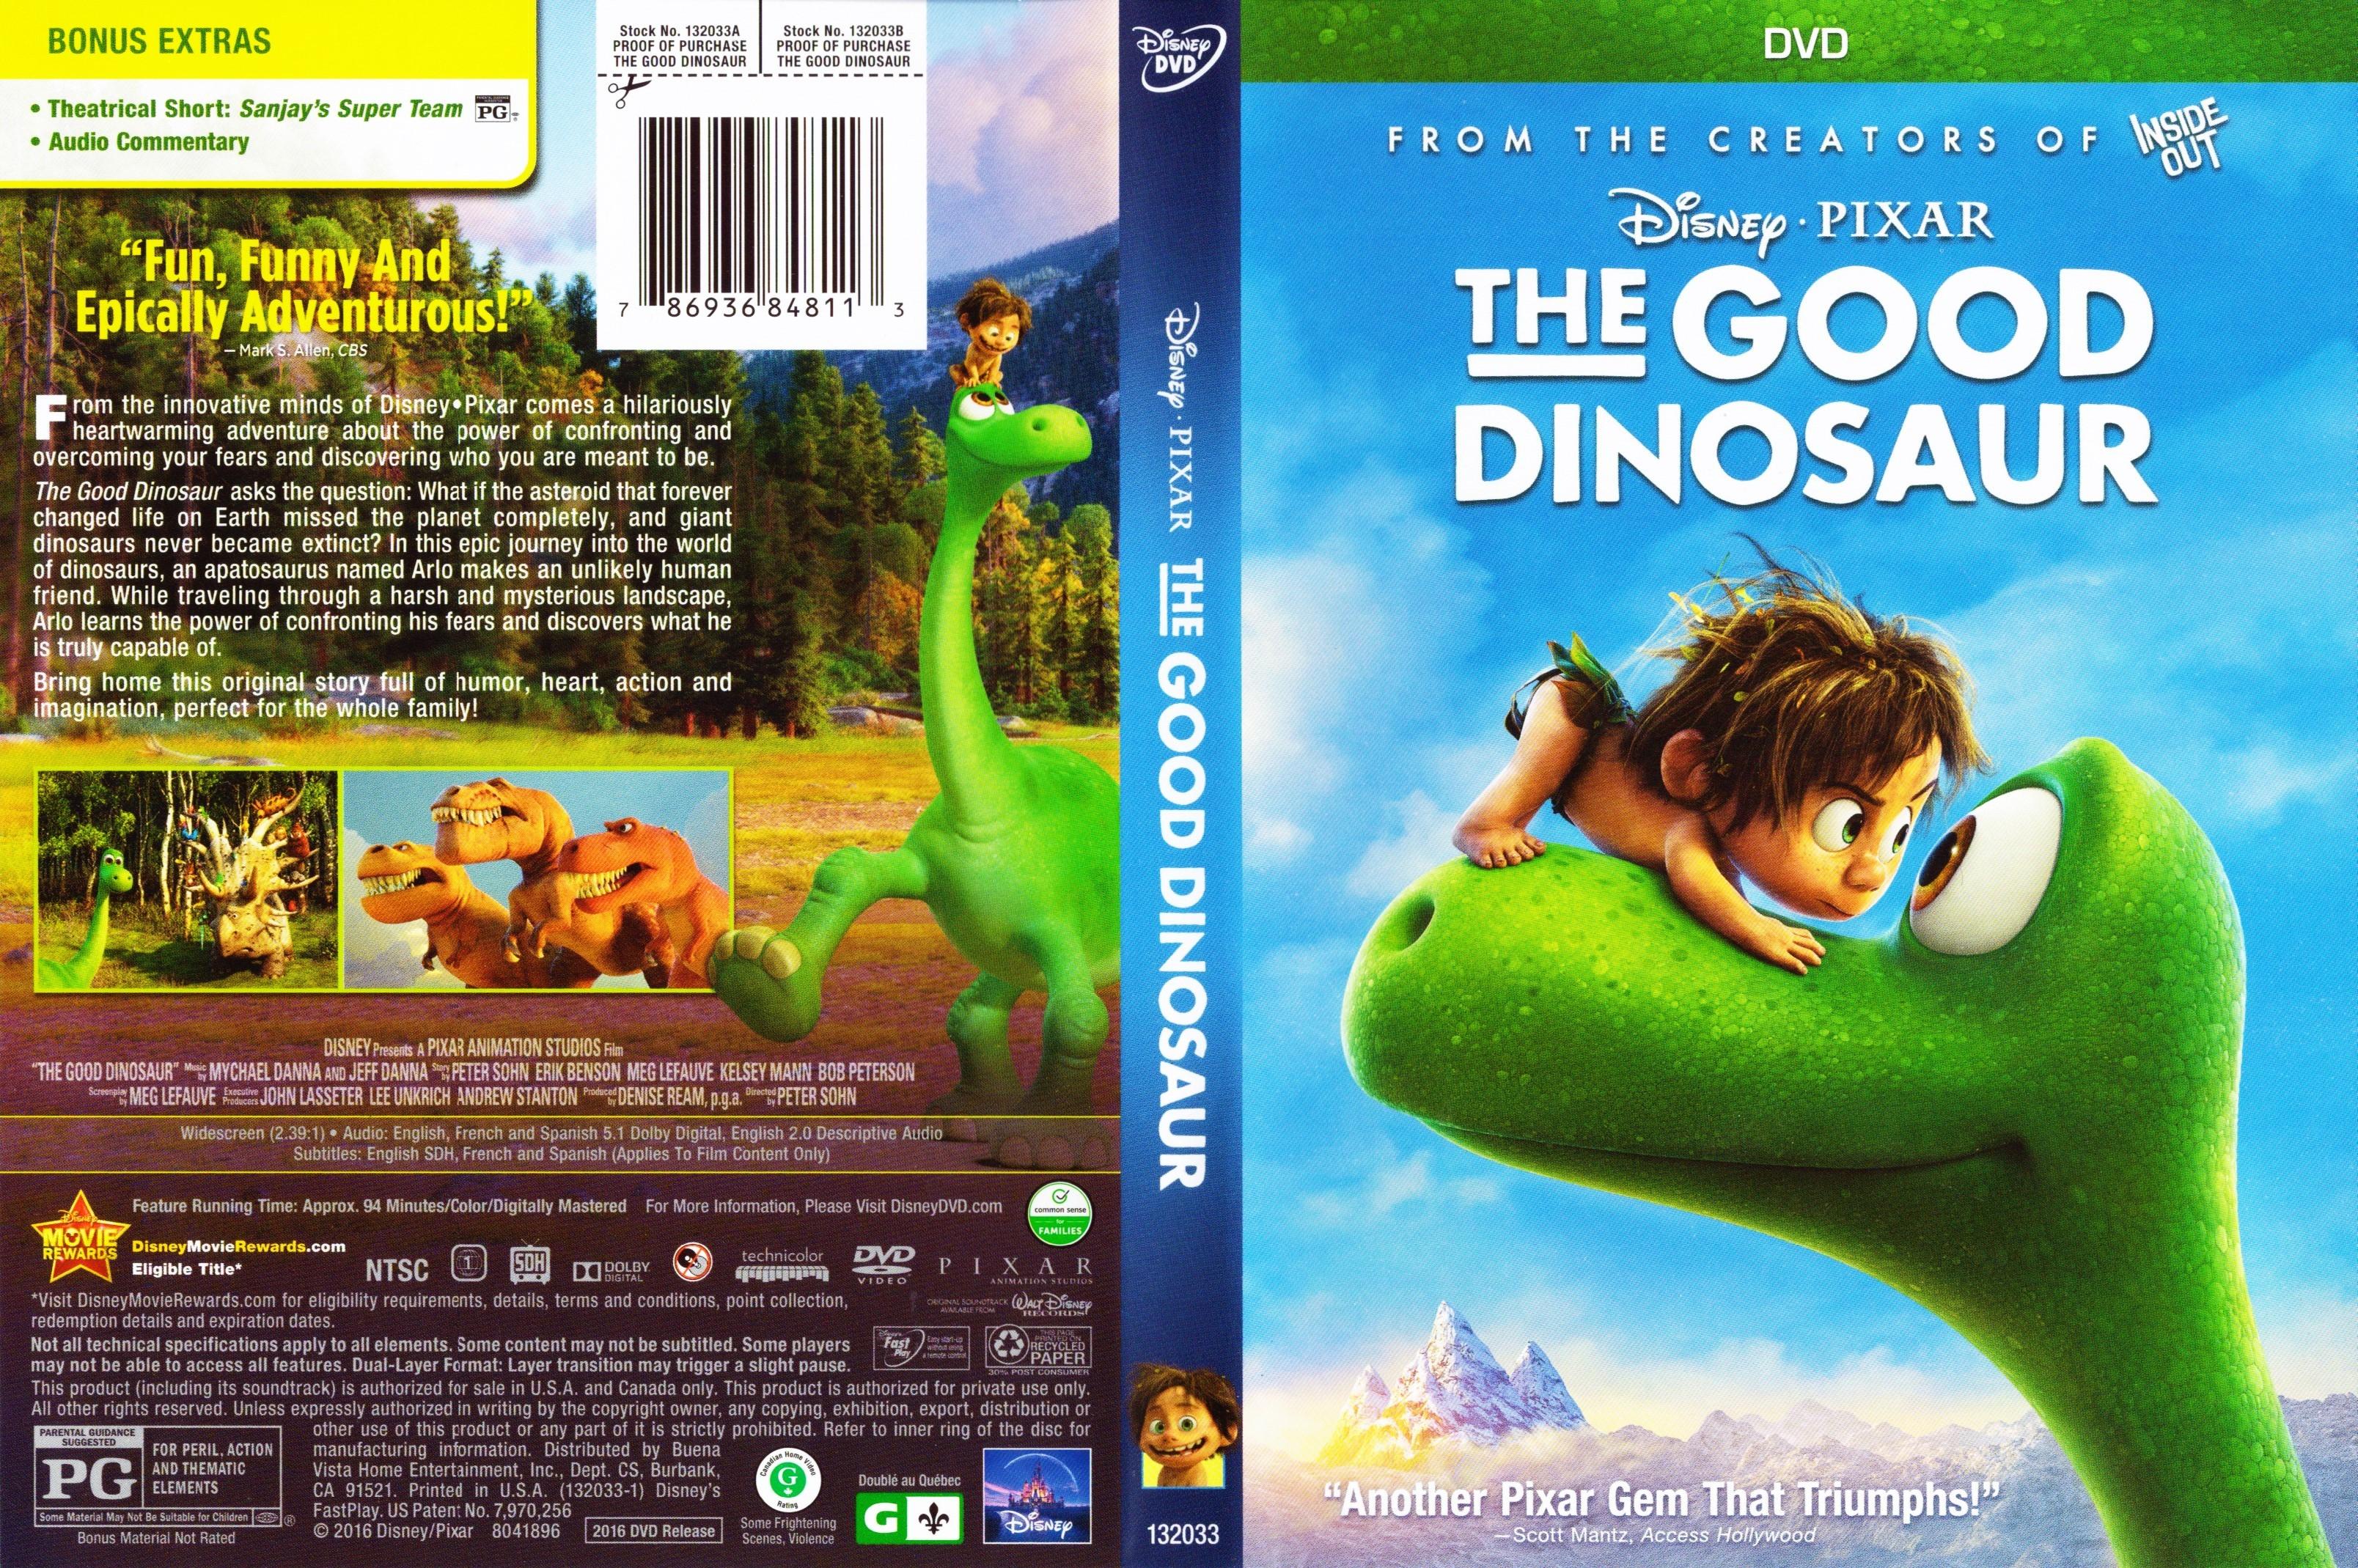 The Good Dinosaur (2015) okładka